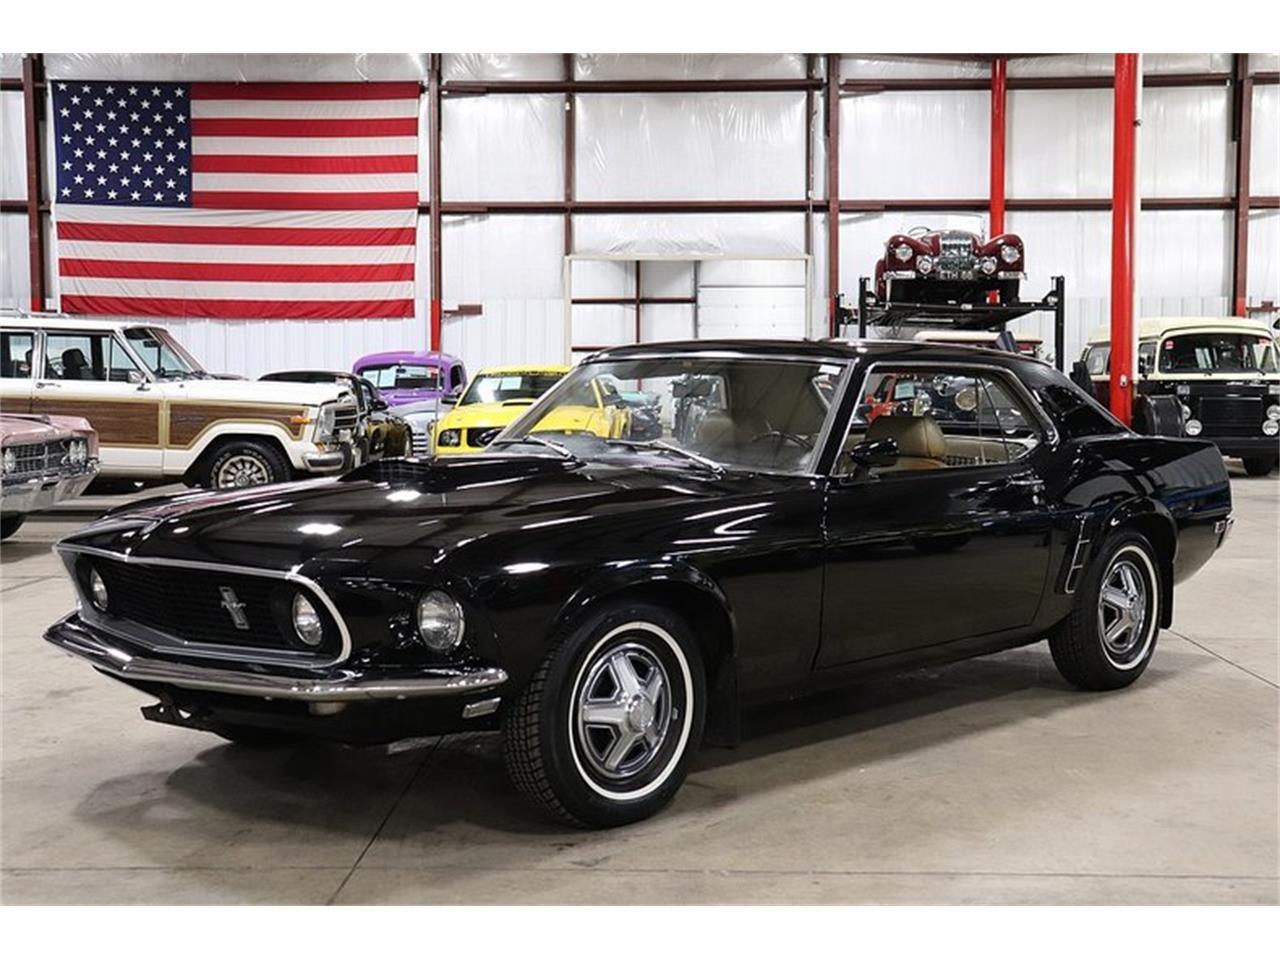 Ford Mustang 1969 prix tout compris 1969